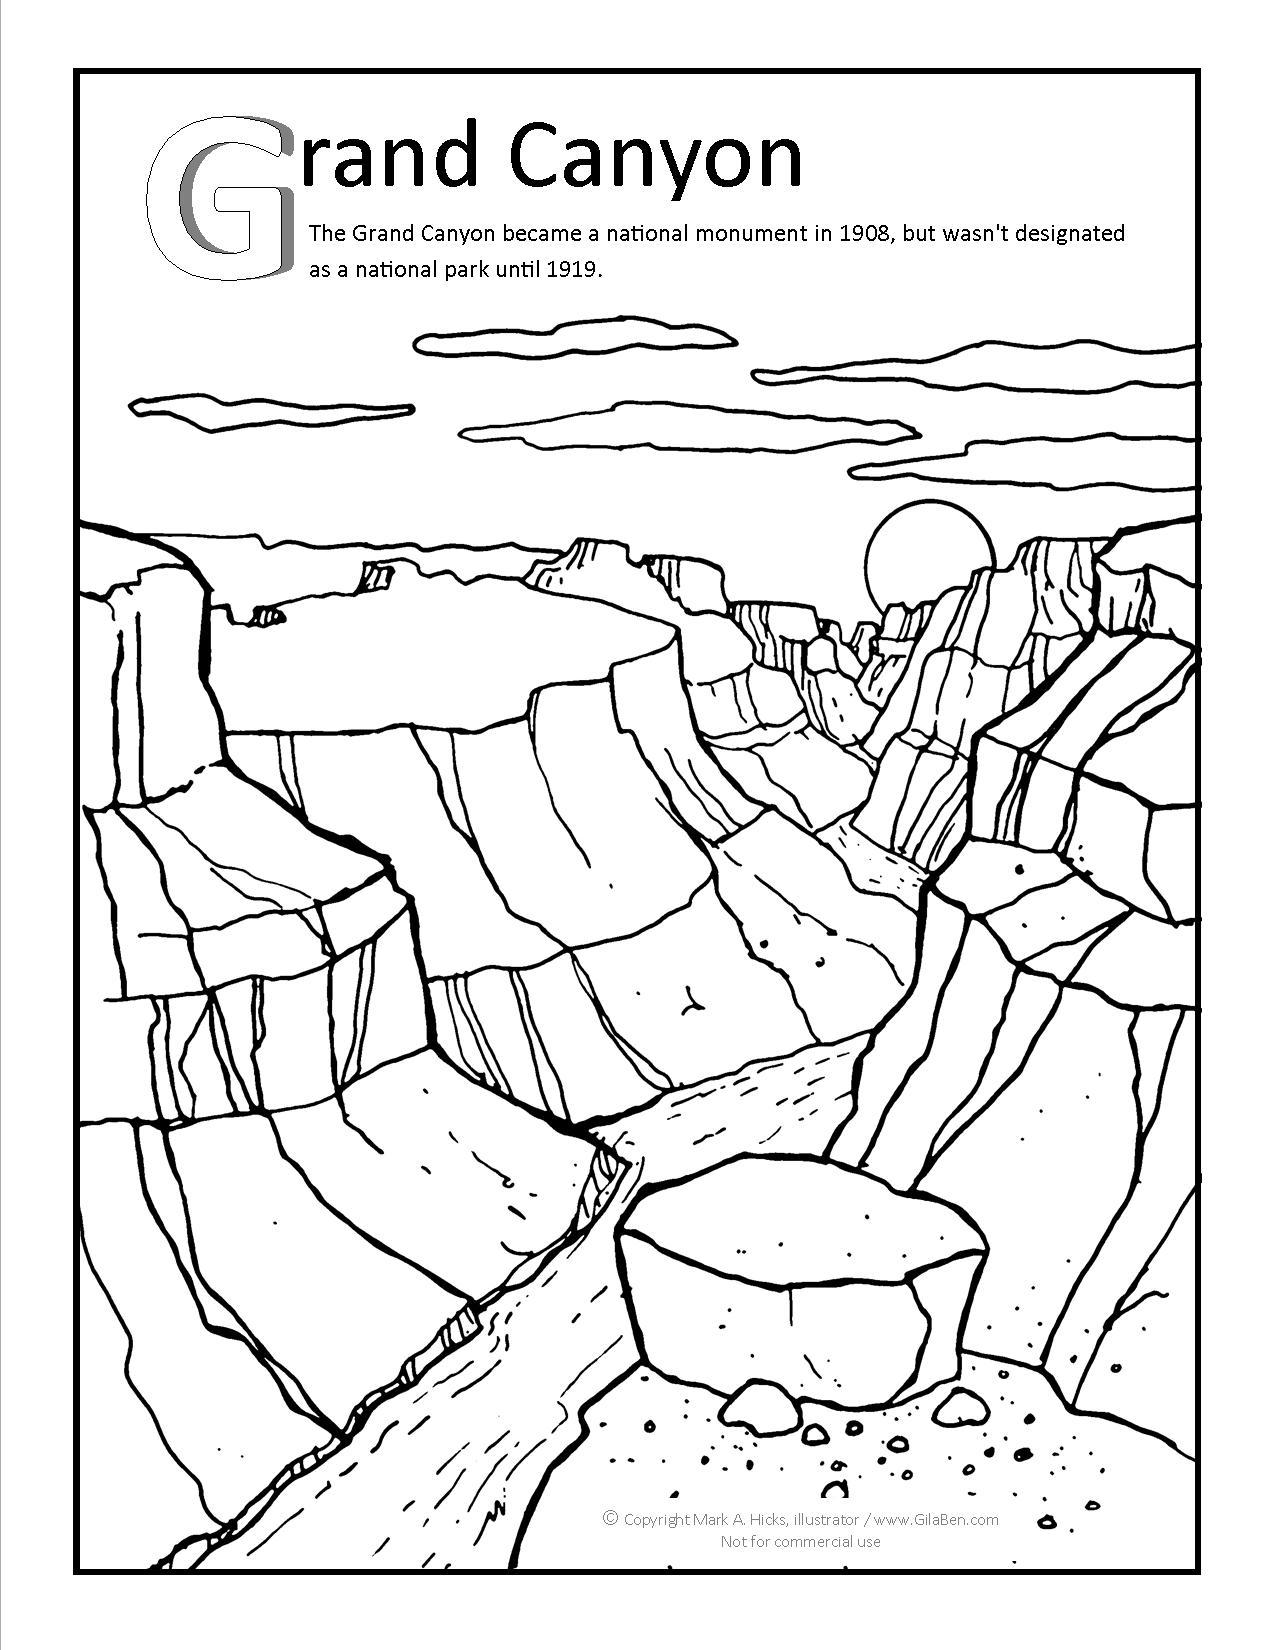 Grand Canyon coloring #15, Download drawings